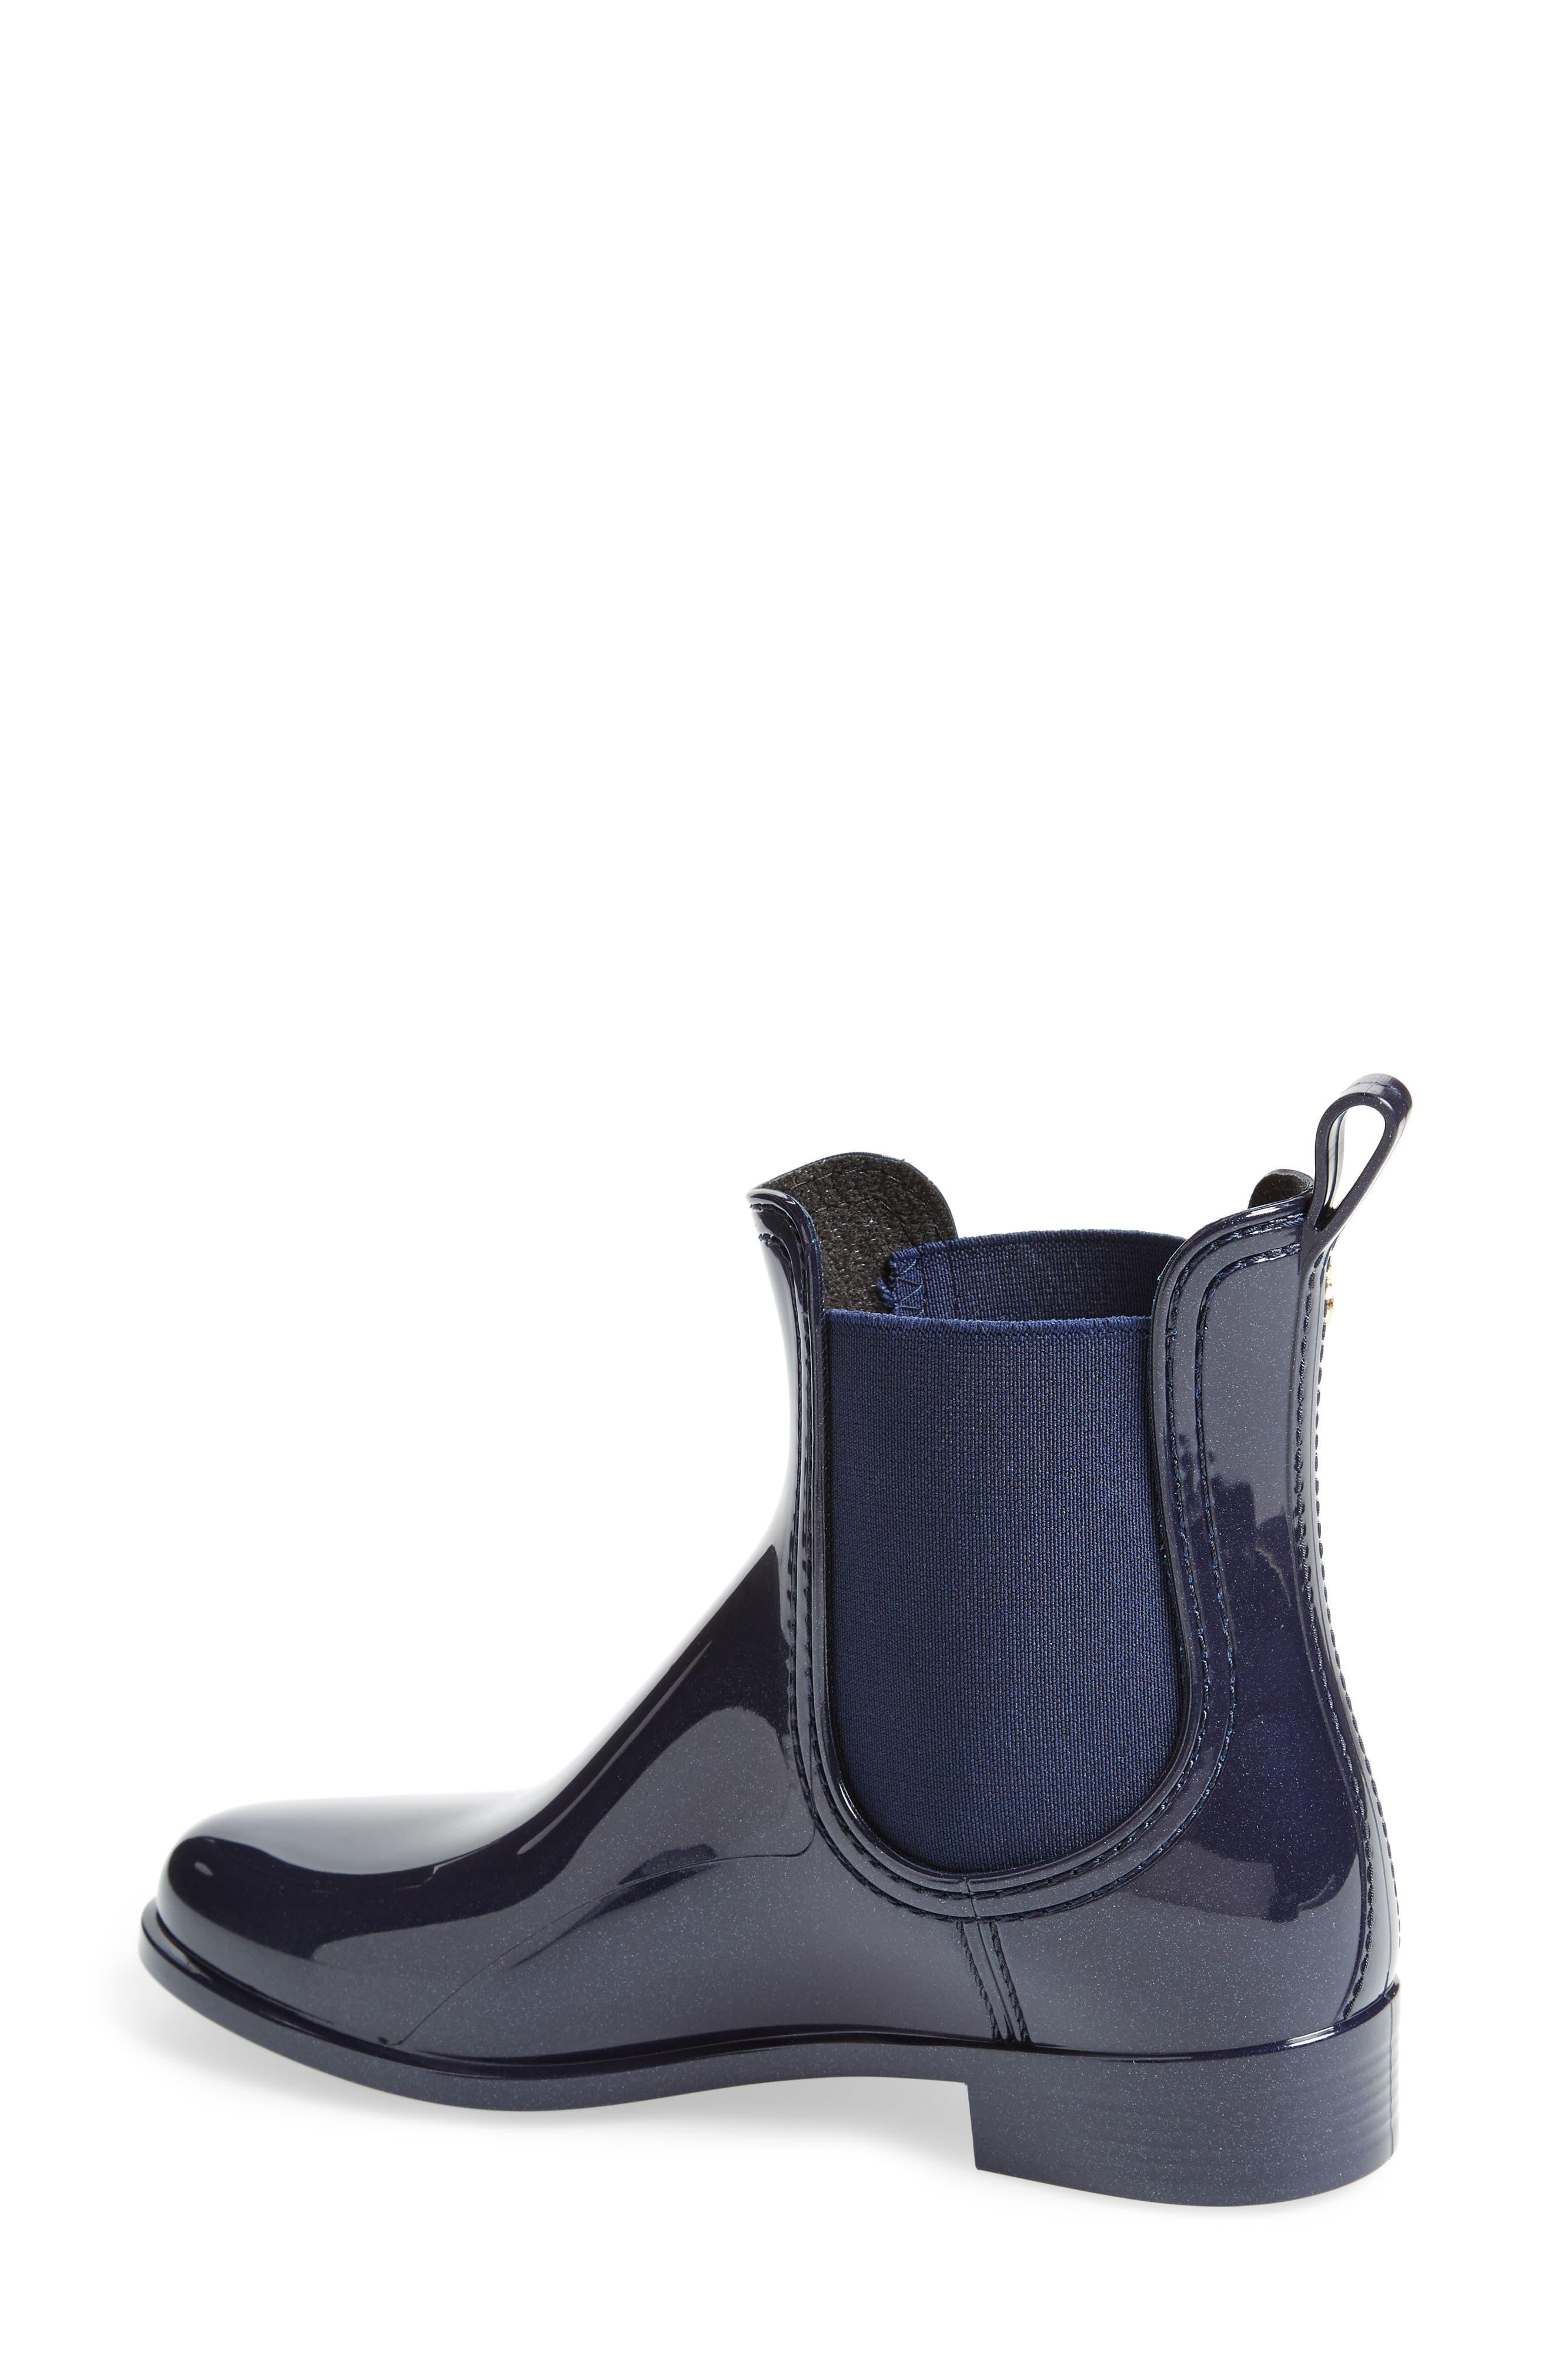 Alternate Image 2  - Lemon Jelly Comfy Waterproof Chelsea Boot (Women)